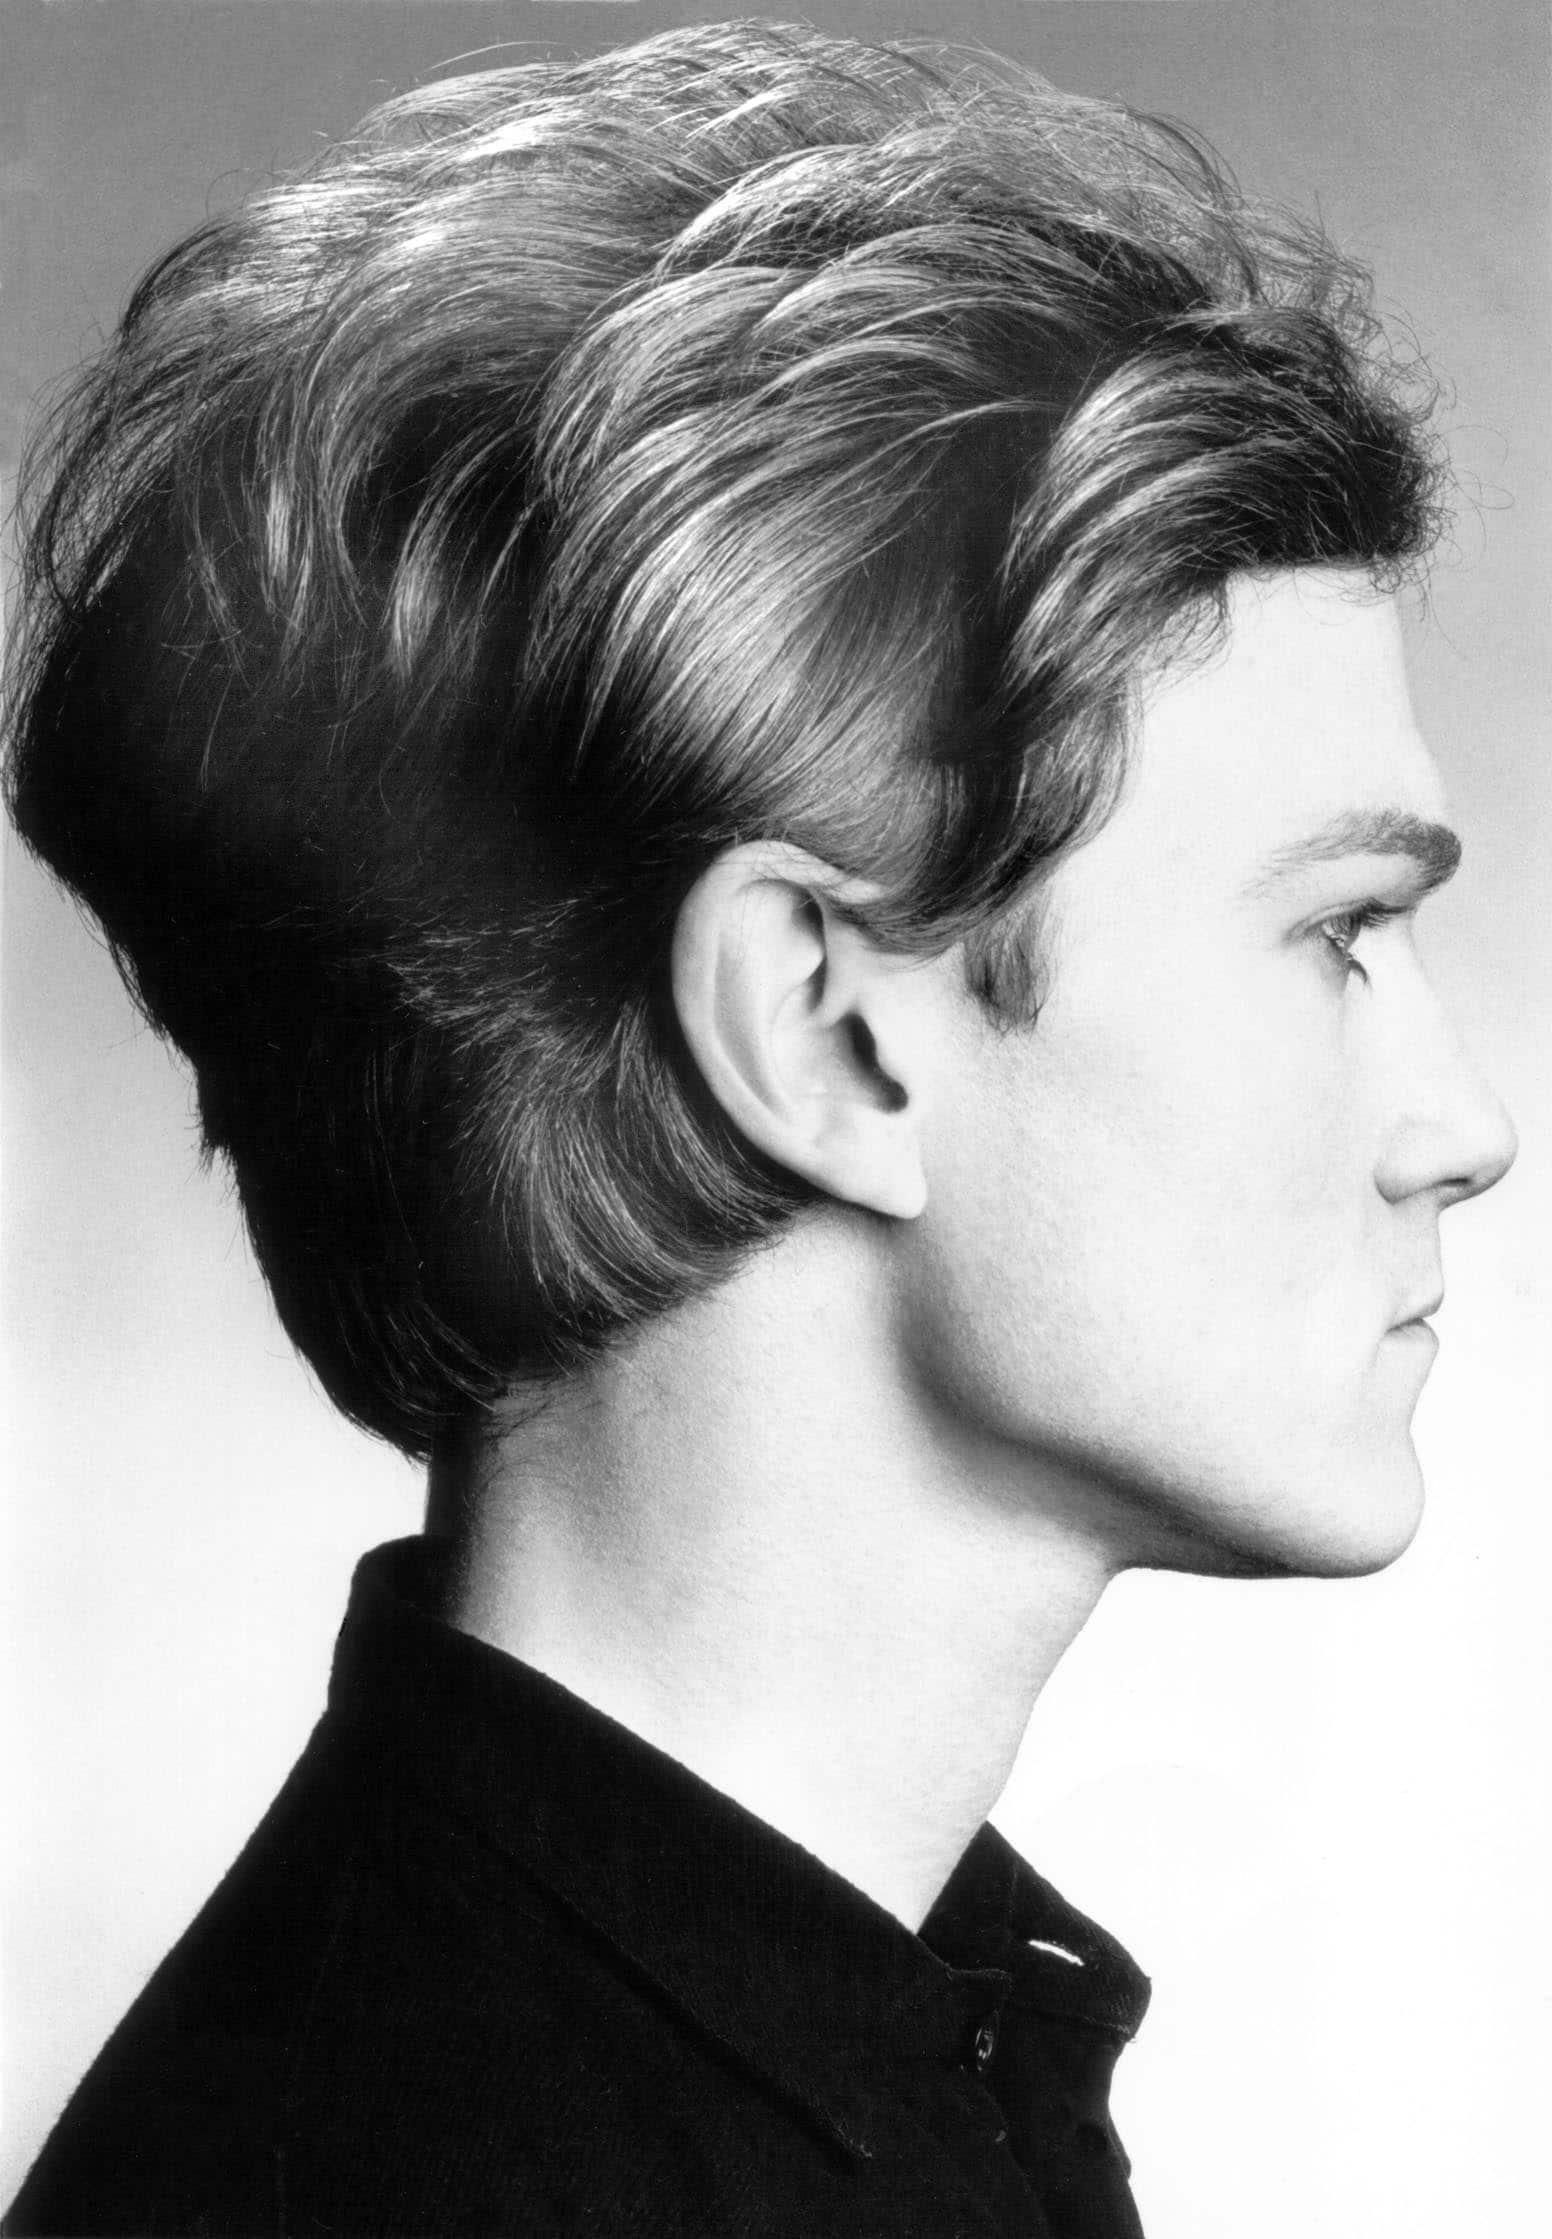 Foxx-Profile-1980-sm-